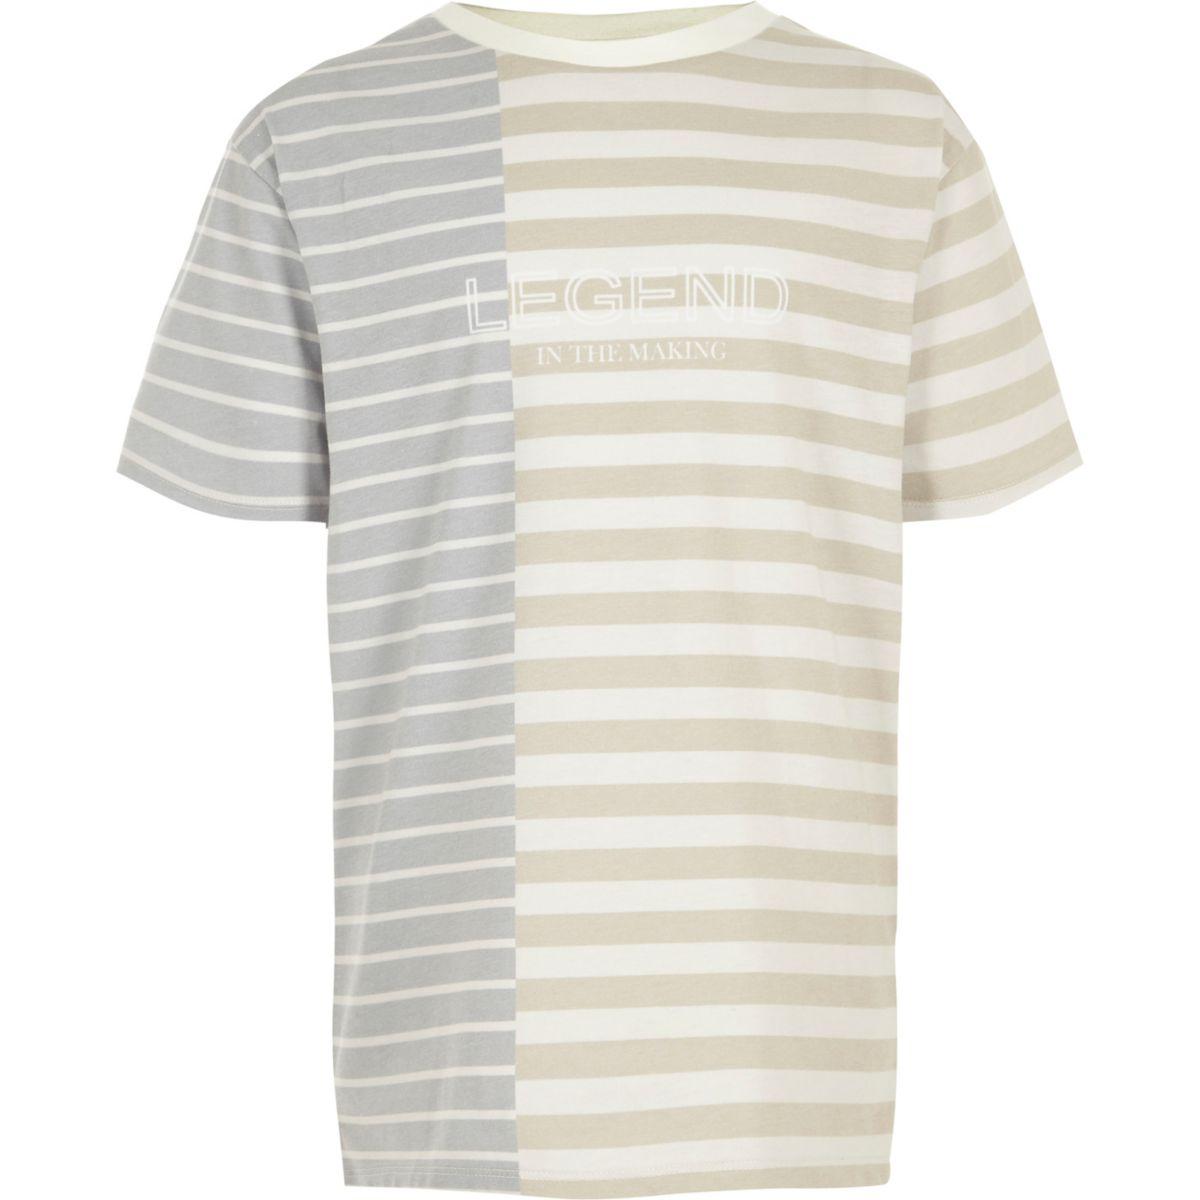 Boys cream block stripe 'legend' T-shirt